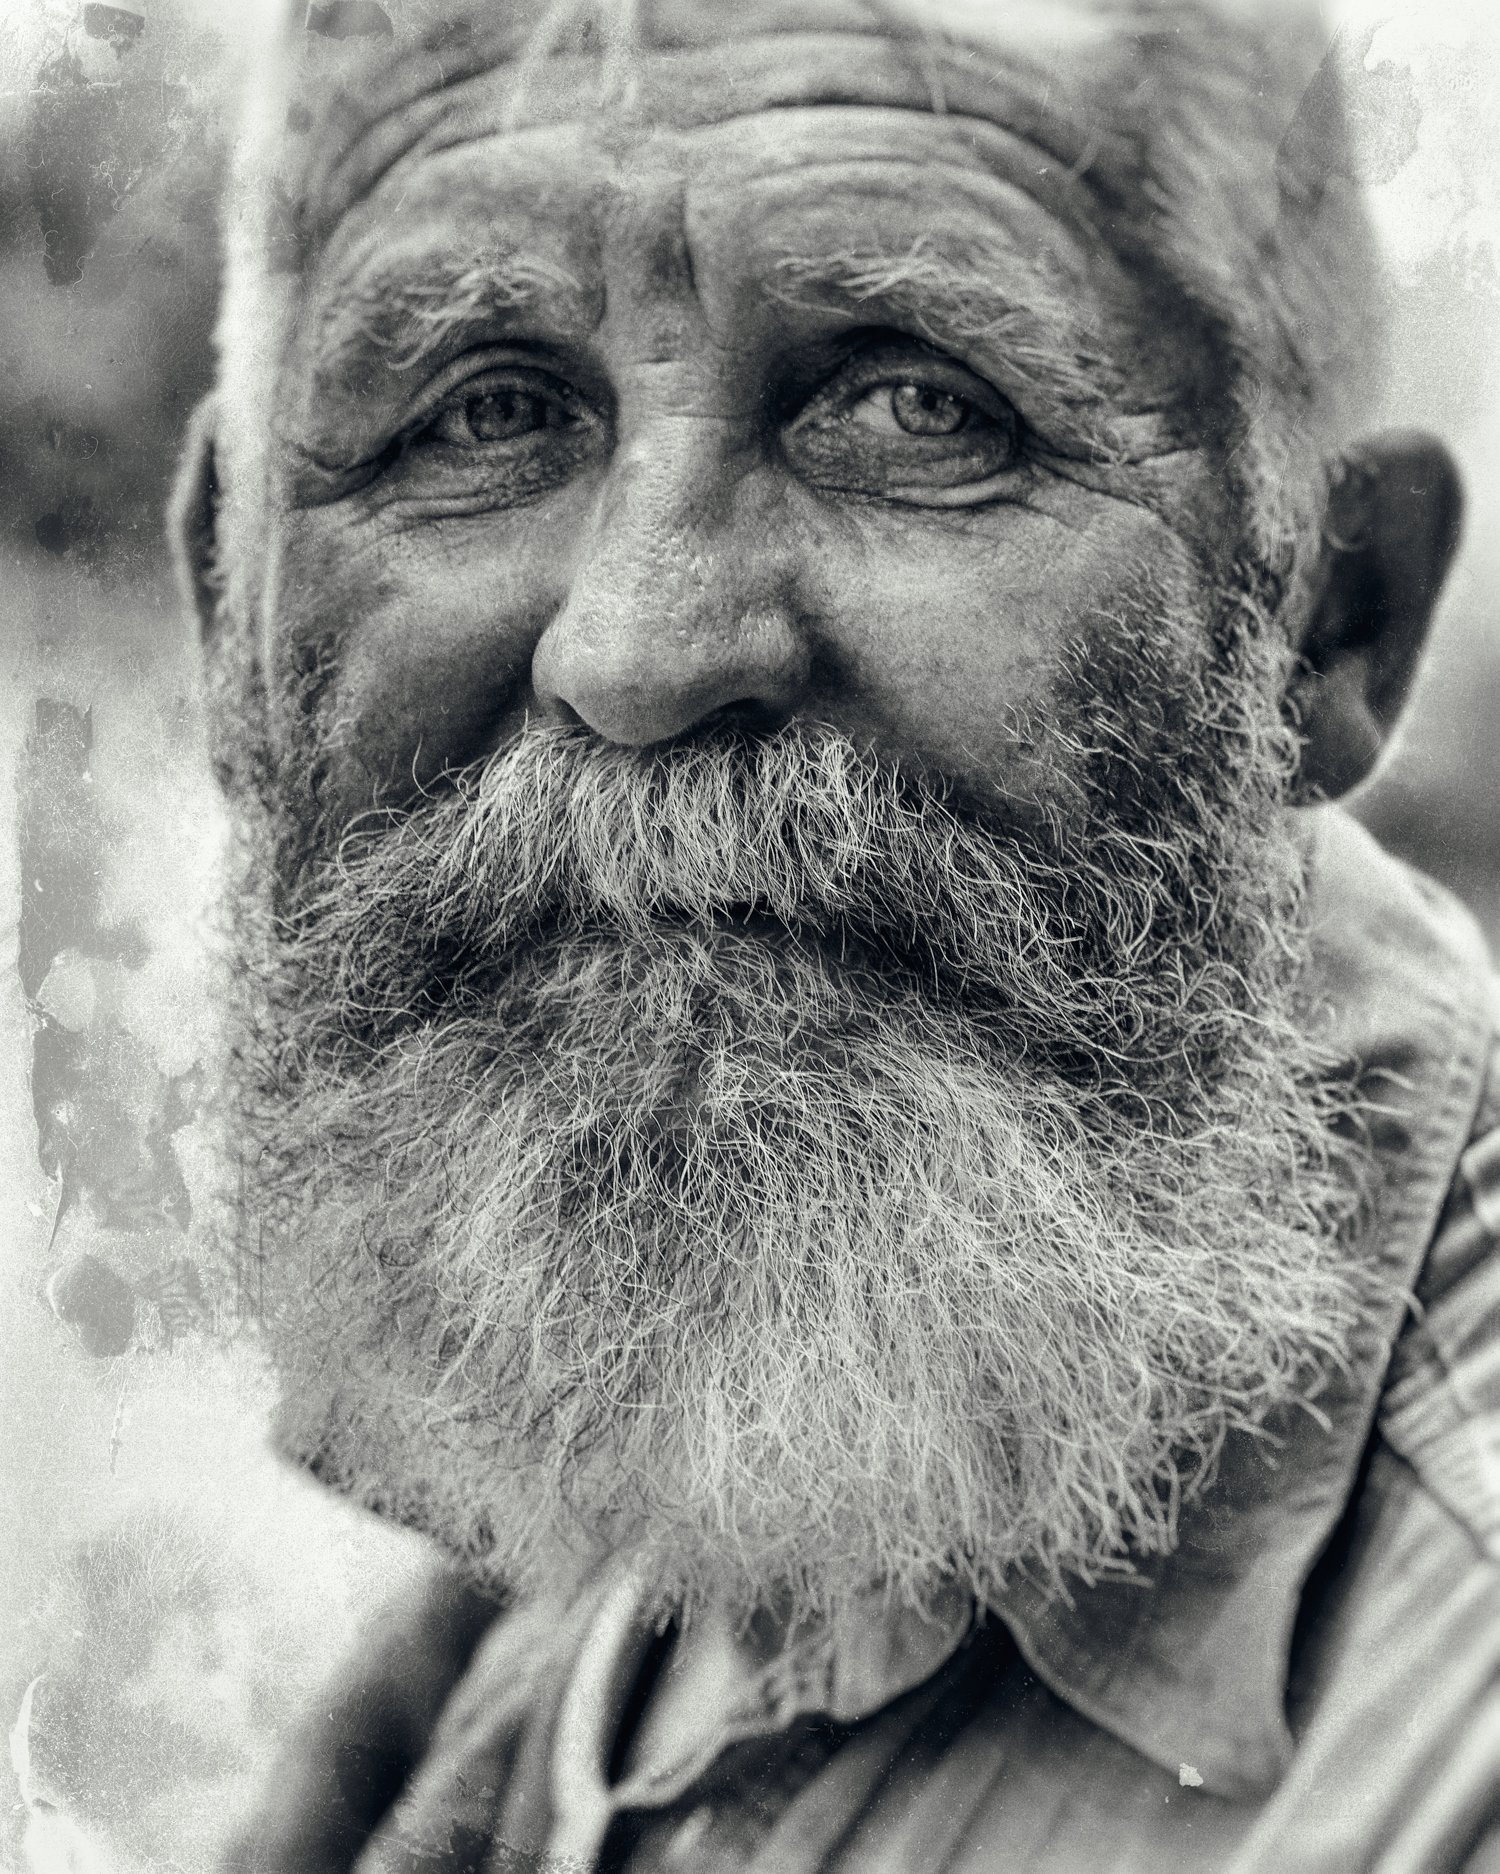 художник,анатолий яговитин,большой городской пленэр, Стяжкин Дмитрий